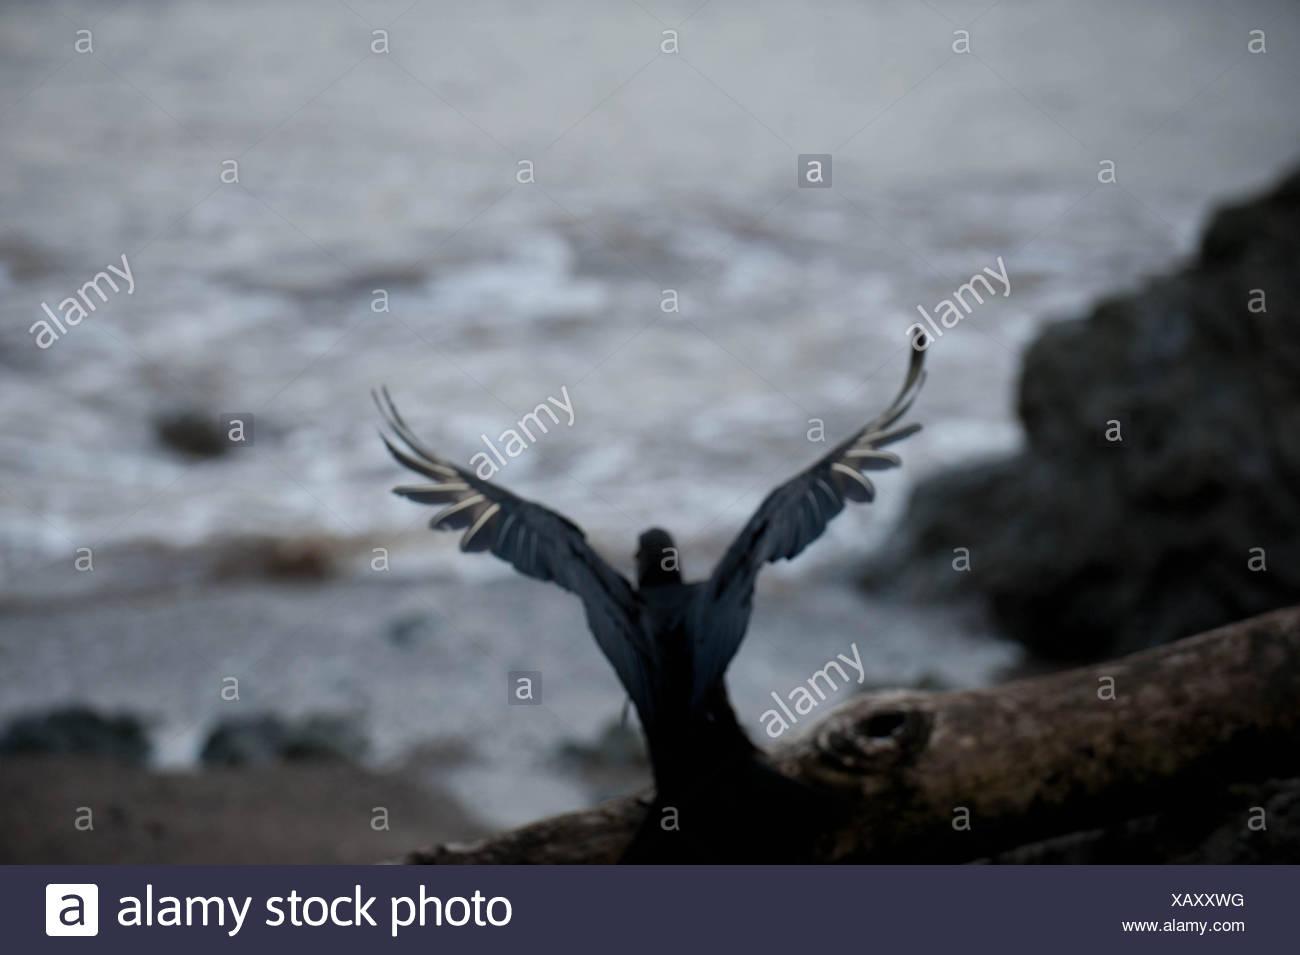 Bird Preparing To Fly Away - Stock Image